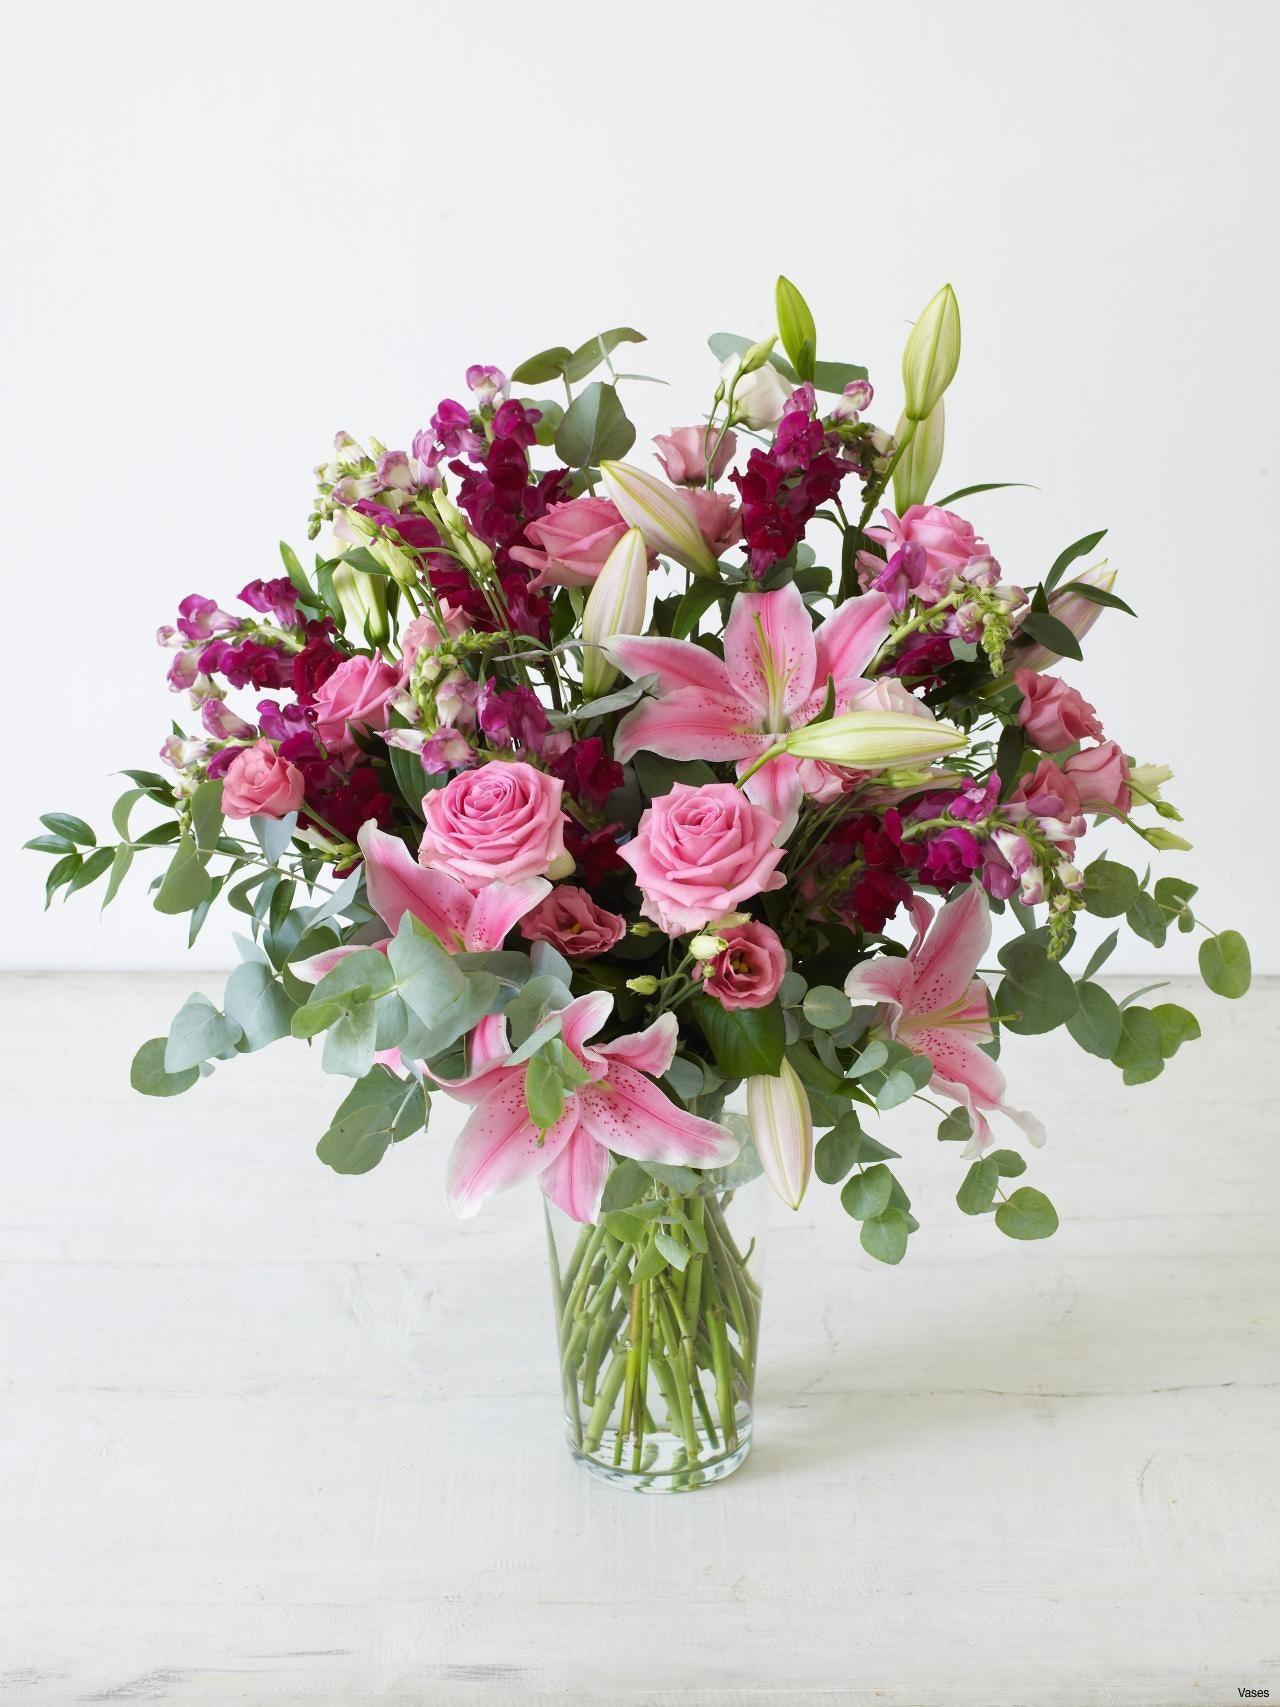 inexpensive vases weddings of 26 luxury wedding centerpieces ideas sokitchenlv within wedding centerpieces ideas new flower arrangements elegant floral arrangements 0d design ideas of 26 luxury wedding